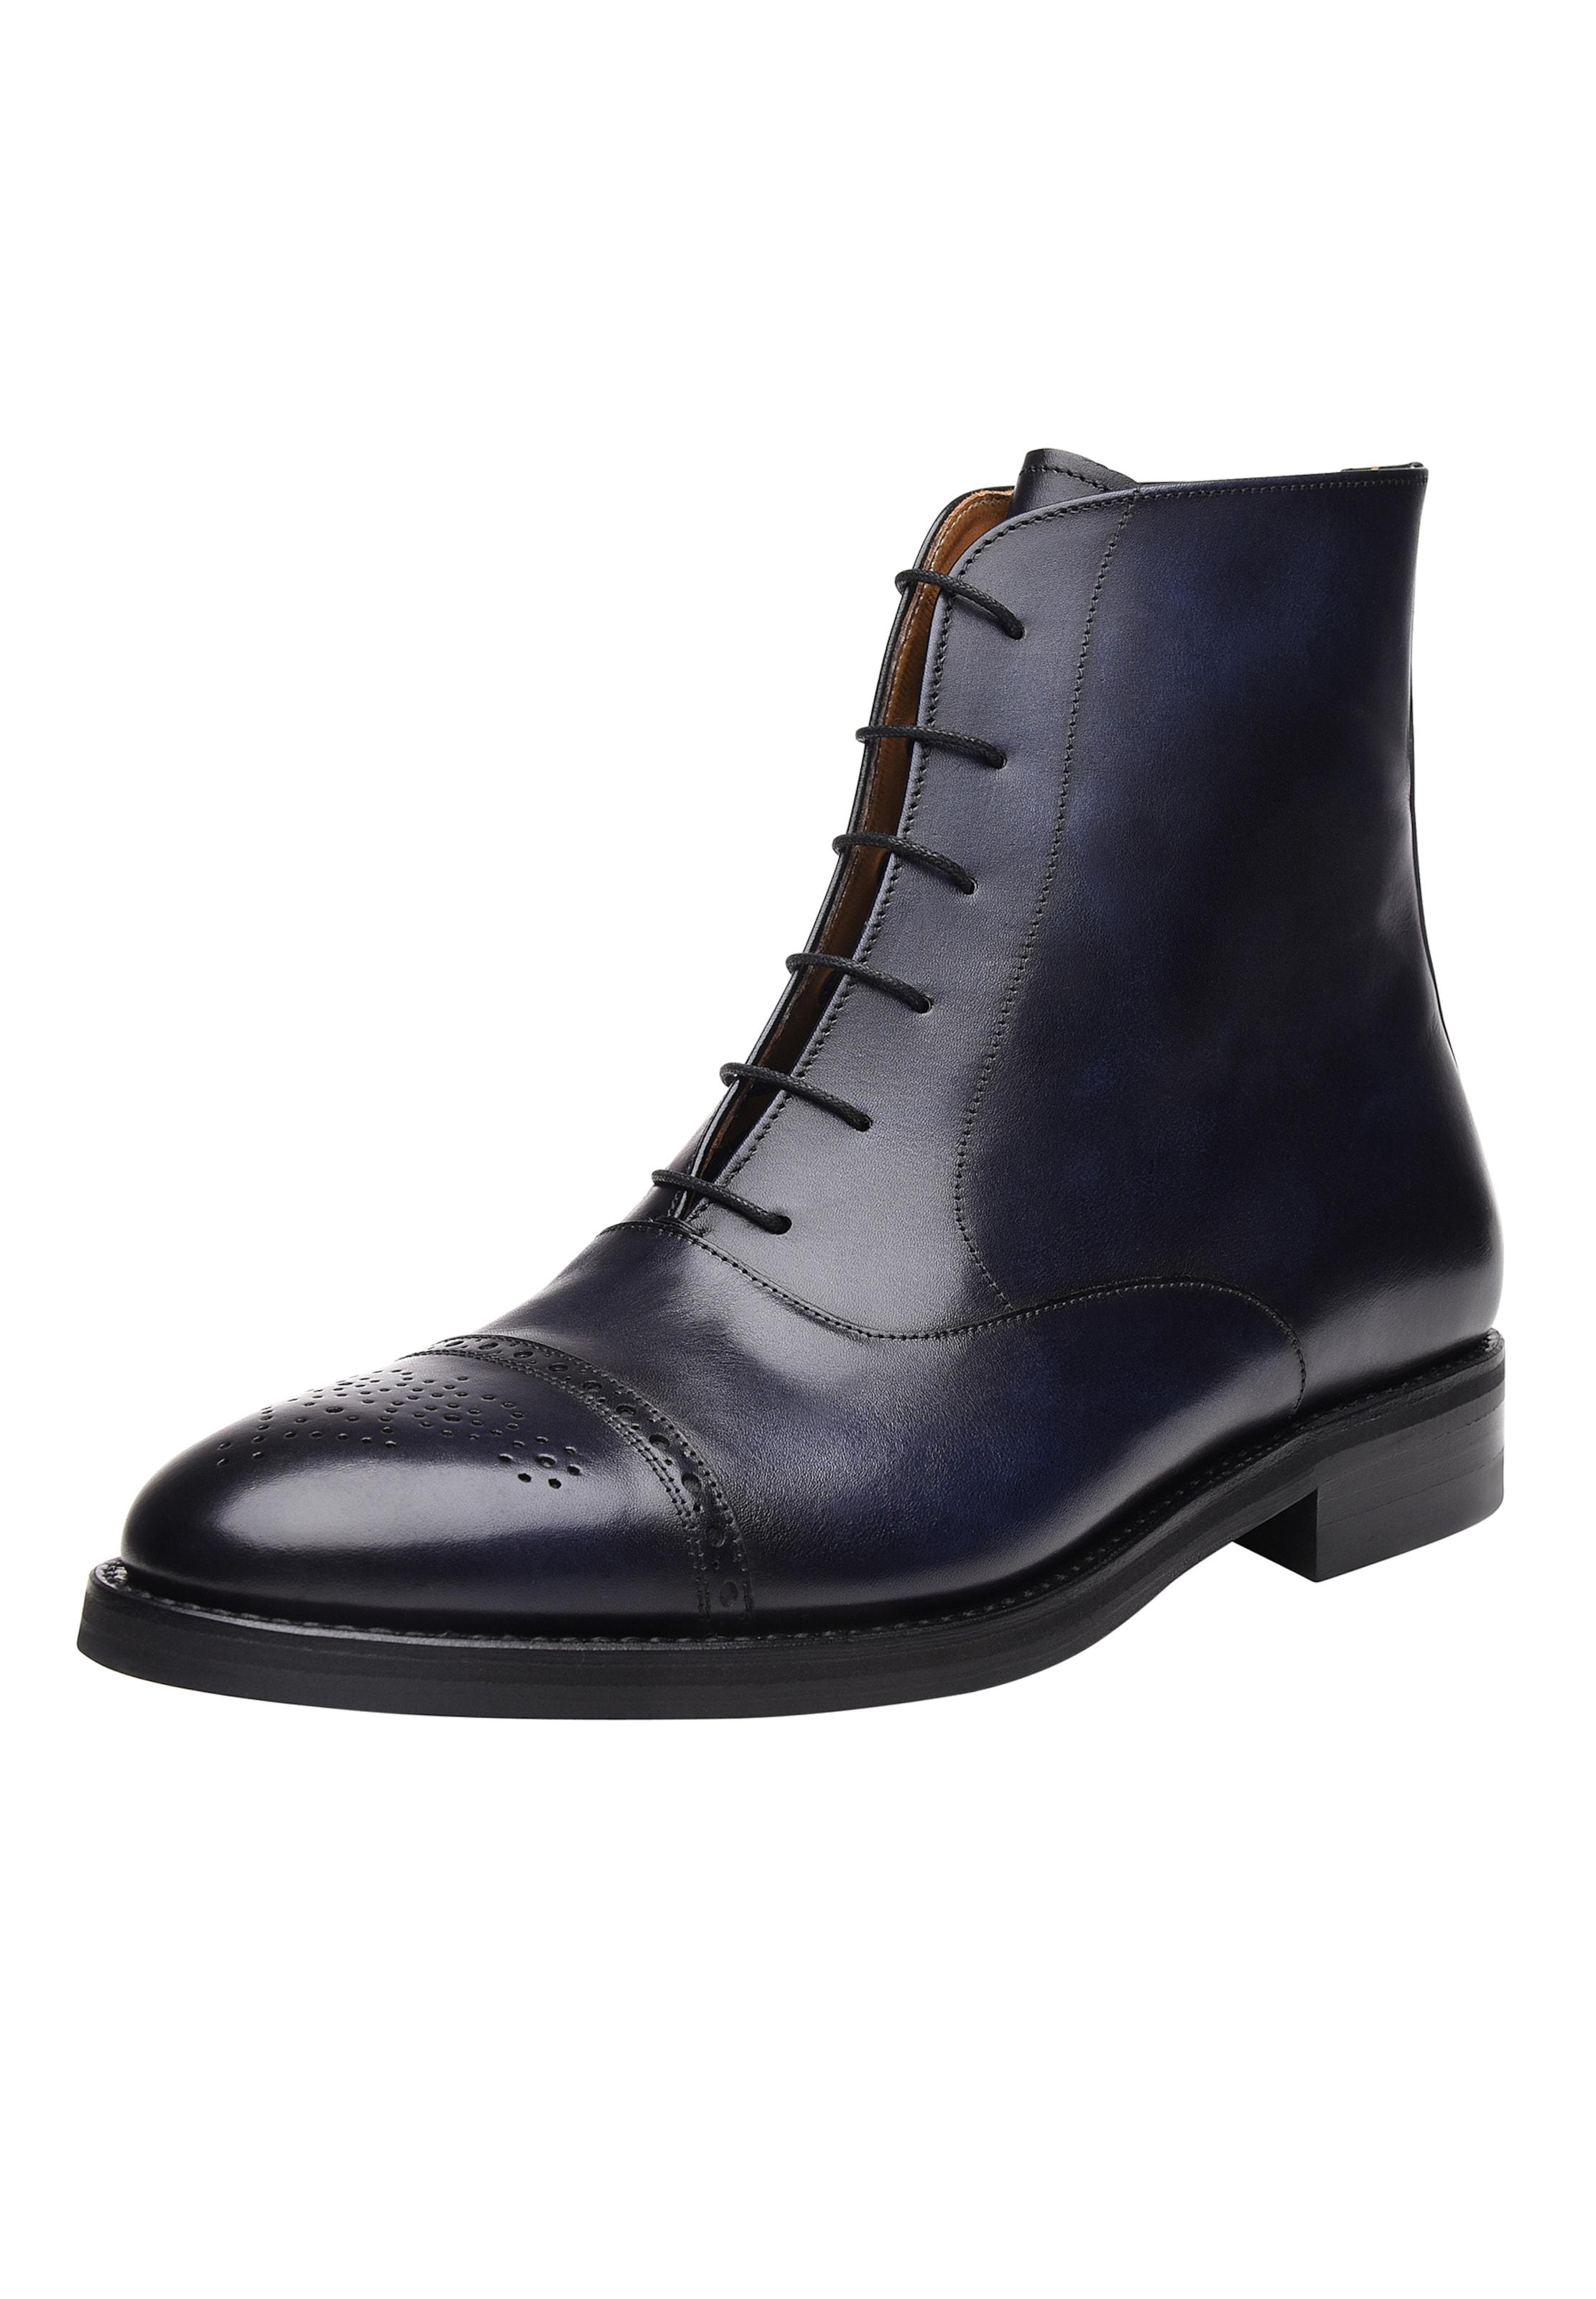 Boots 'no6713' Rahmengenäht Shoepassion Indigo In b6fgvIY7y